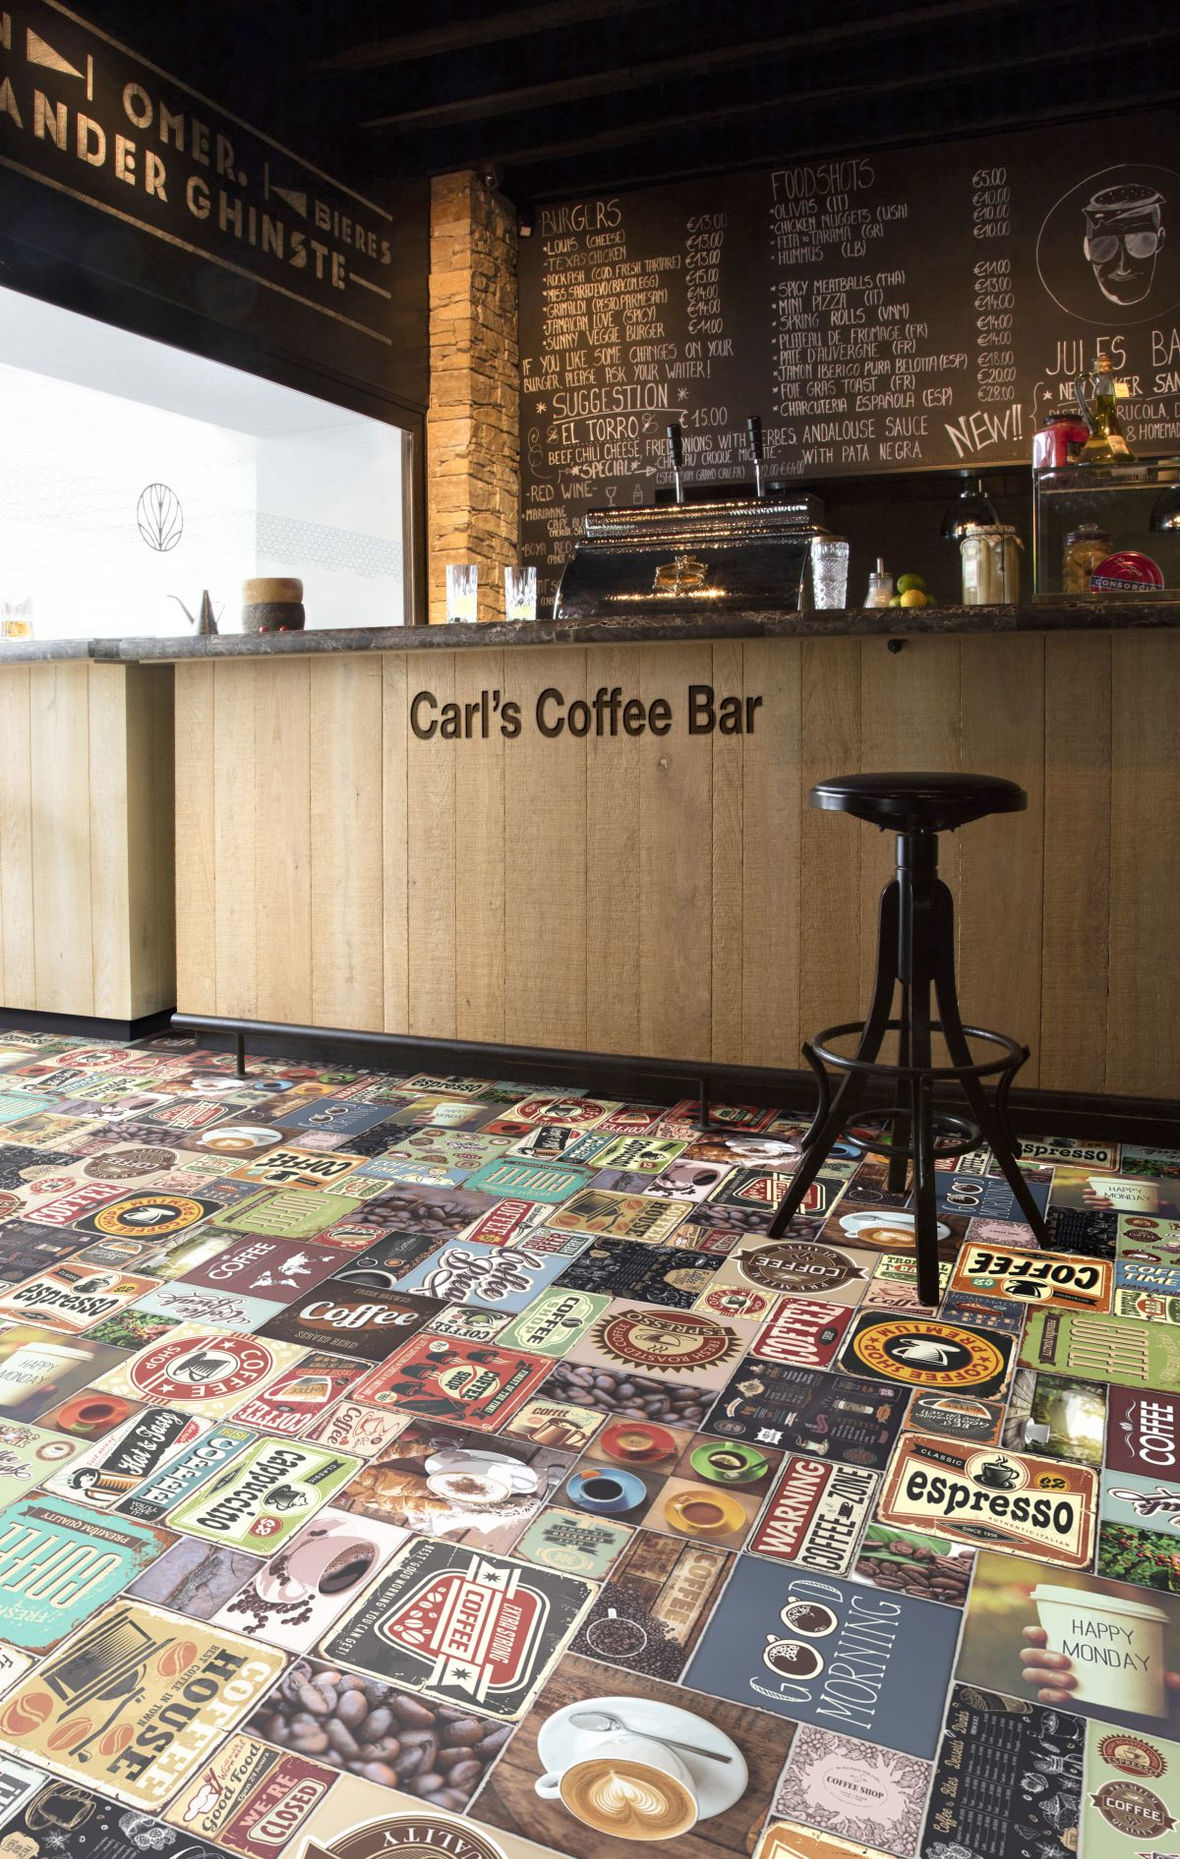 MOONLIGHT COFFEE TIME 4M CIĘCIE